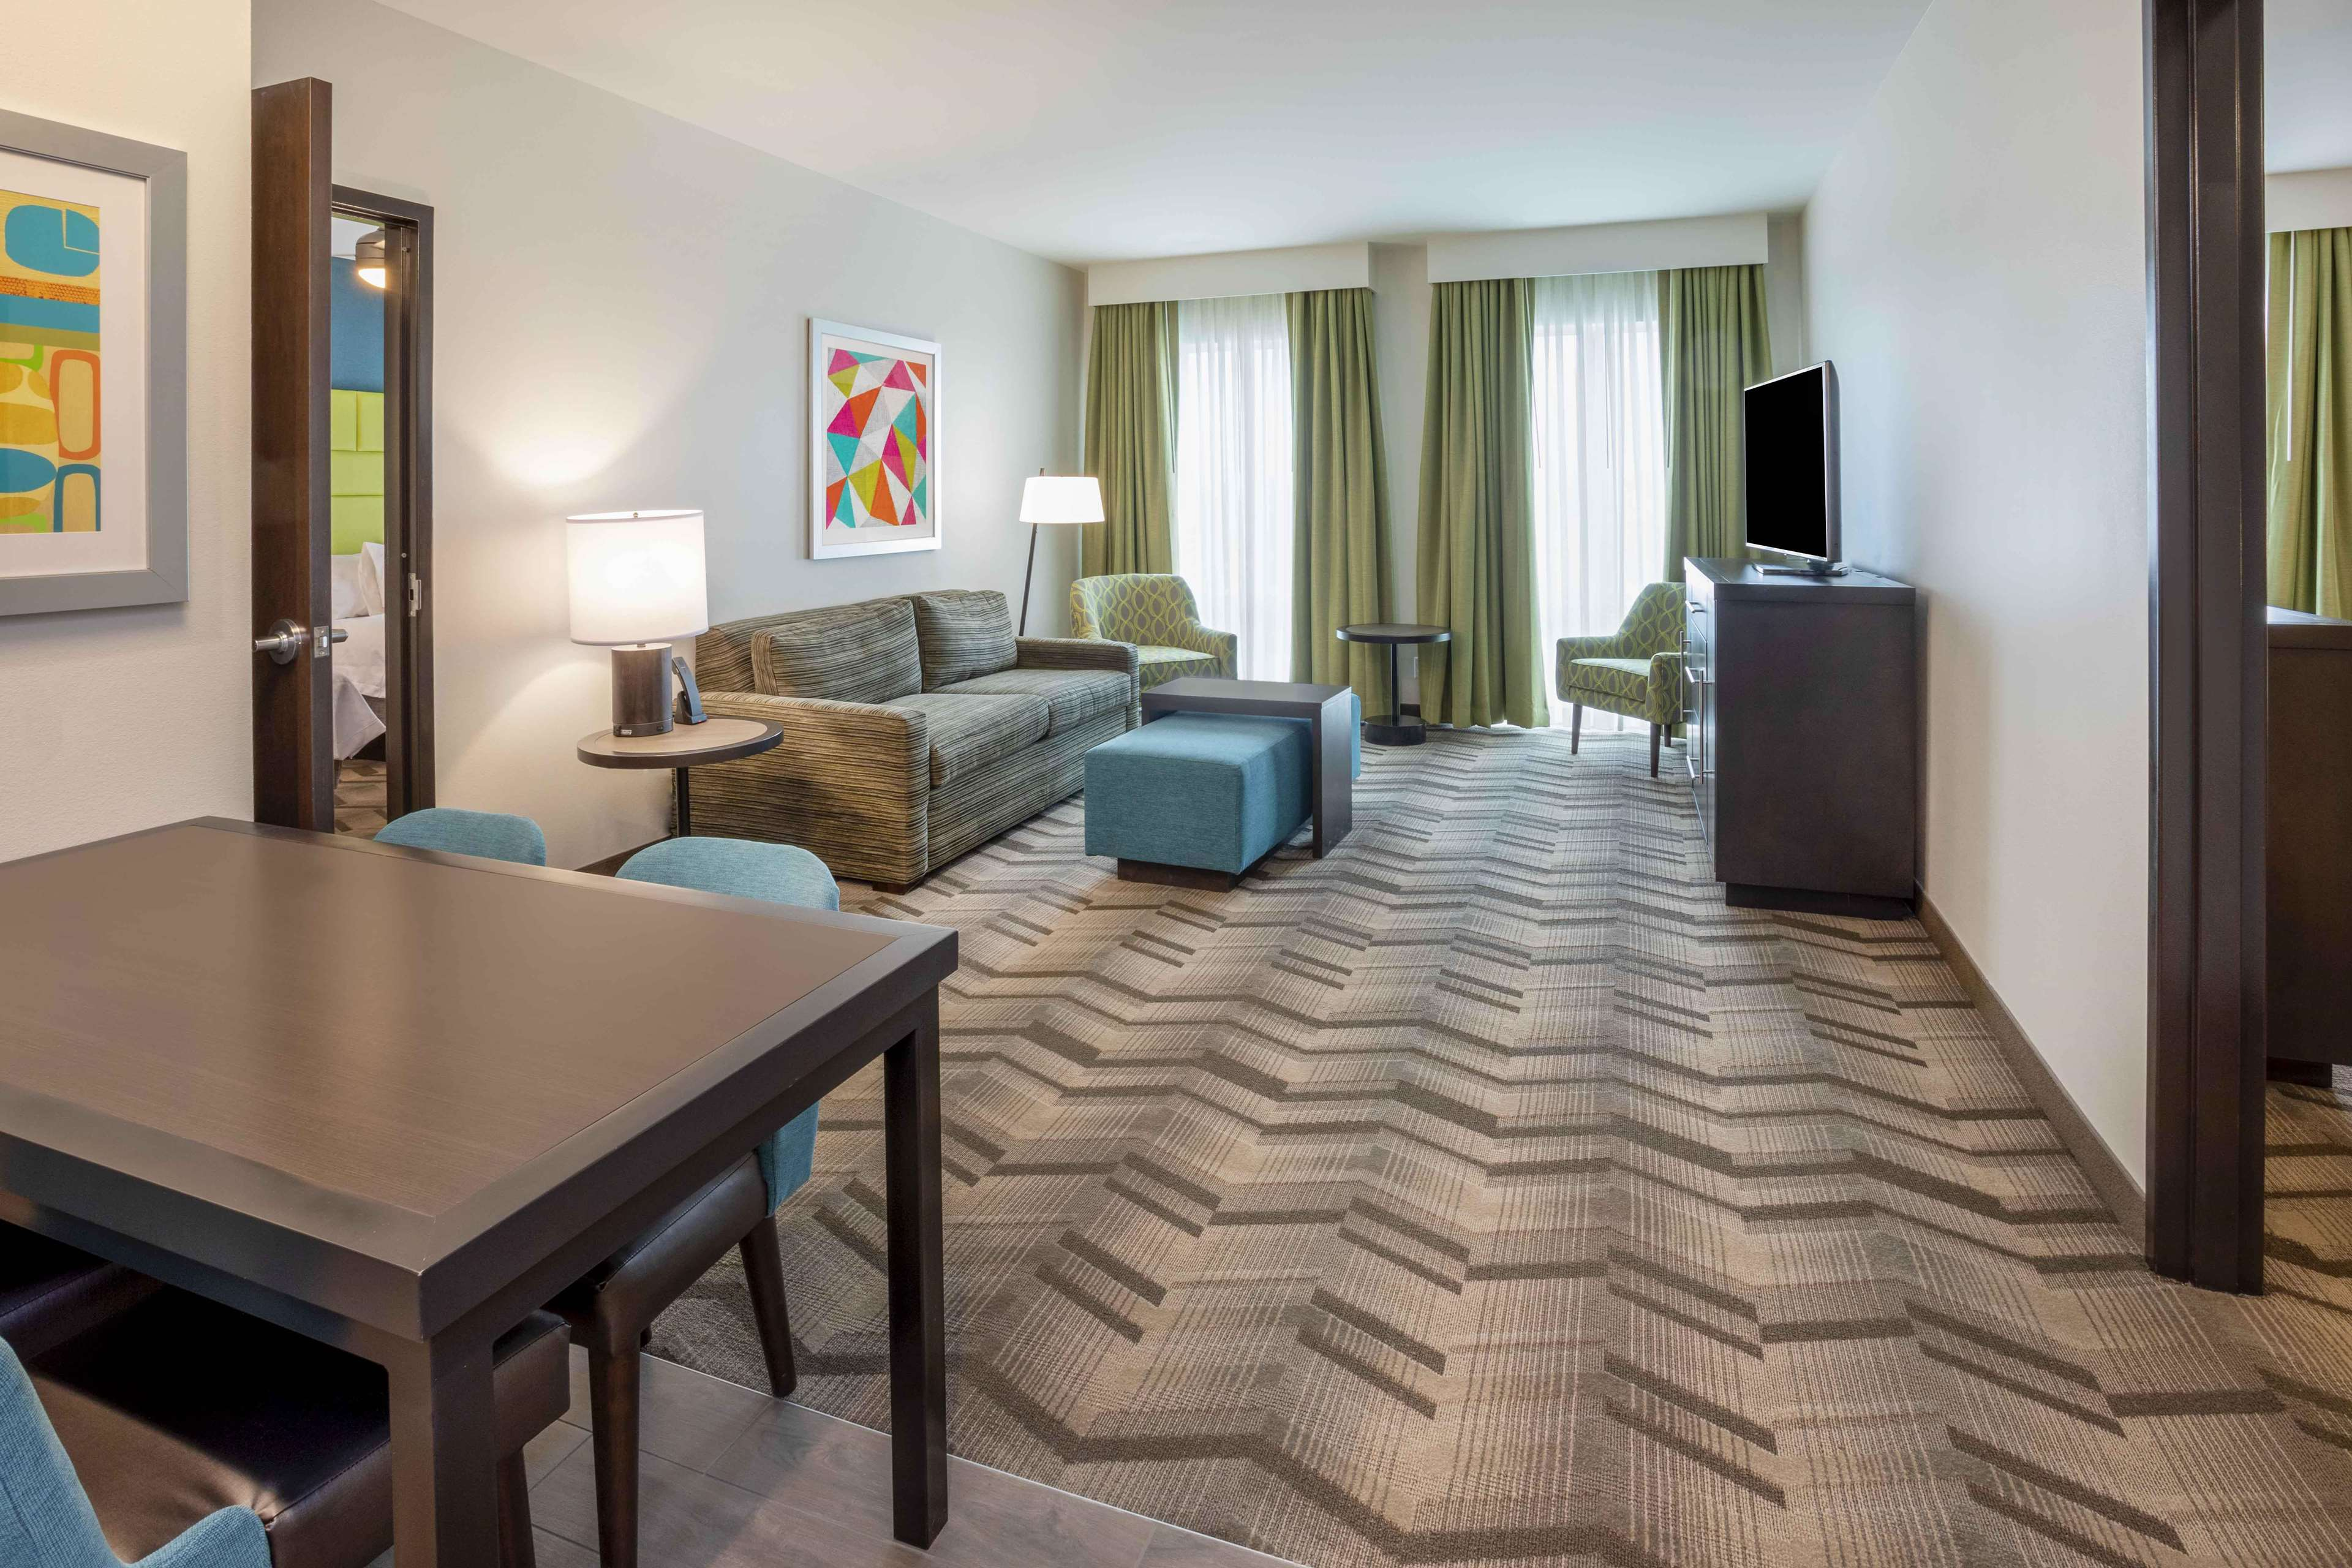 Homewood Suites by Hilton Edina Minneapolis image 18